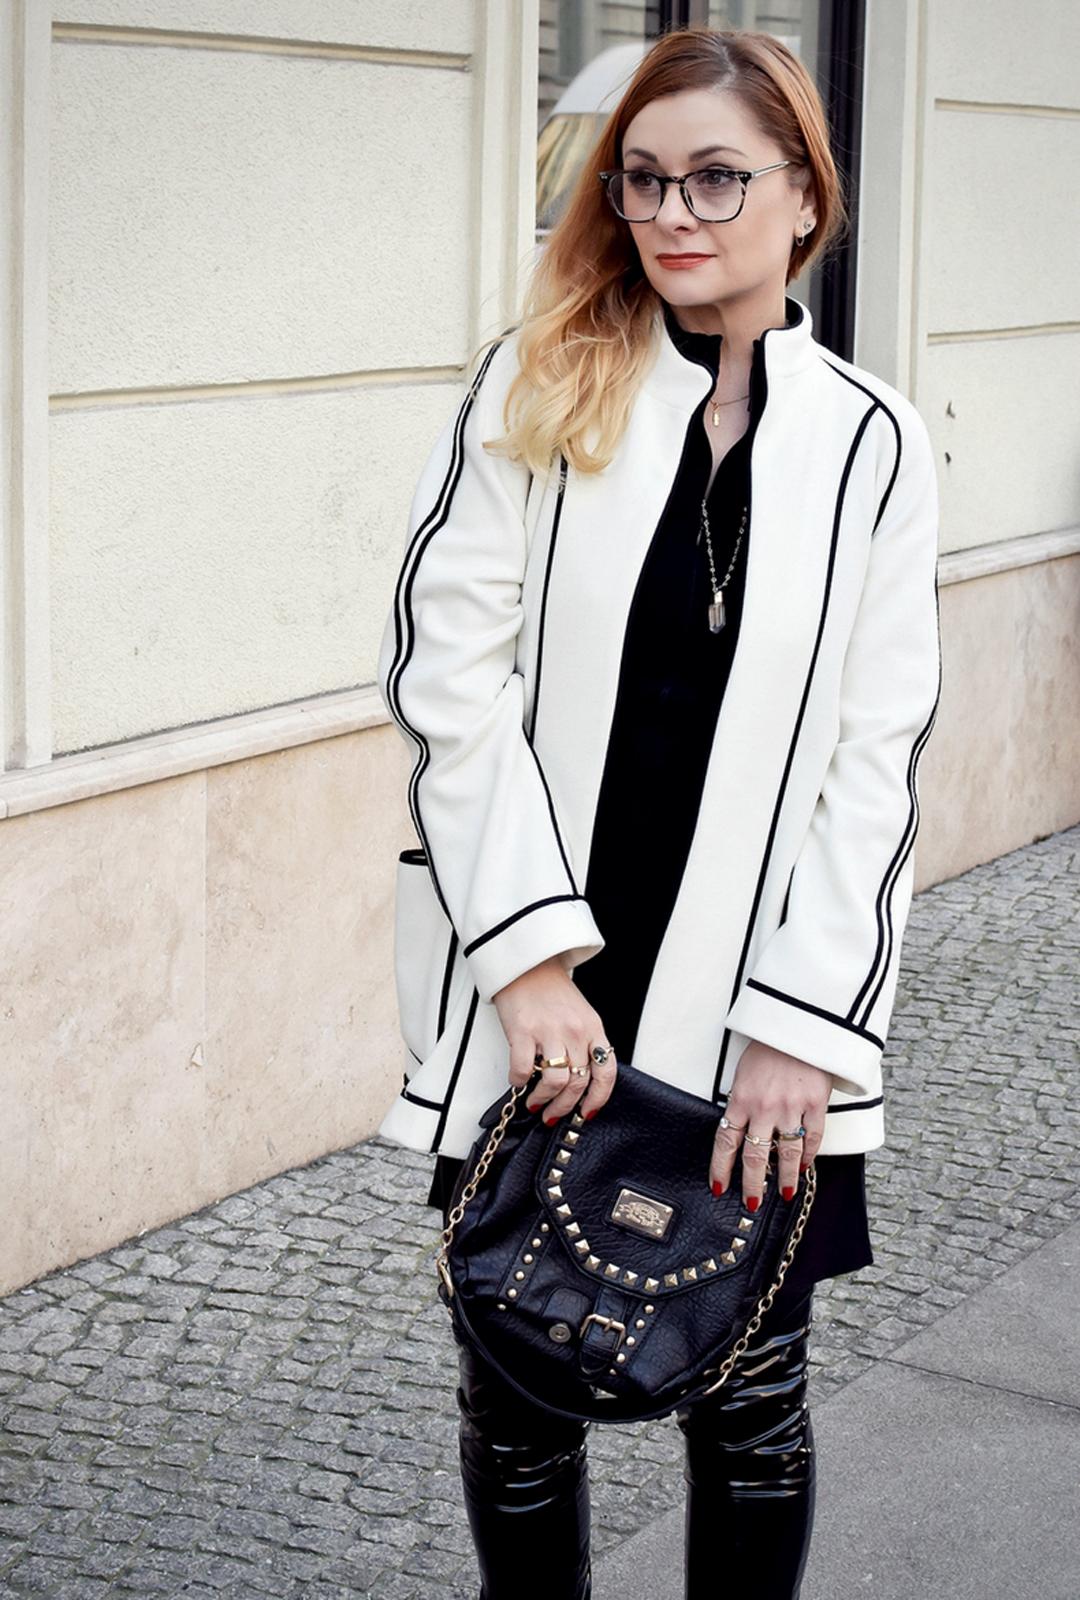 Schwarzes Lackleder modern stylen, Modeblog Ü40 Blog